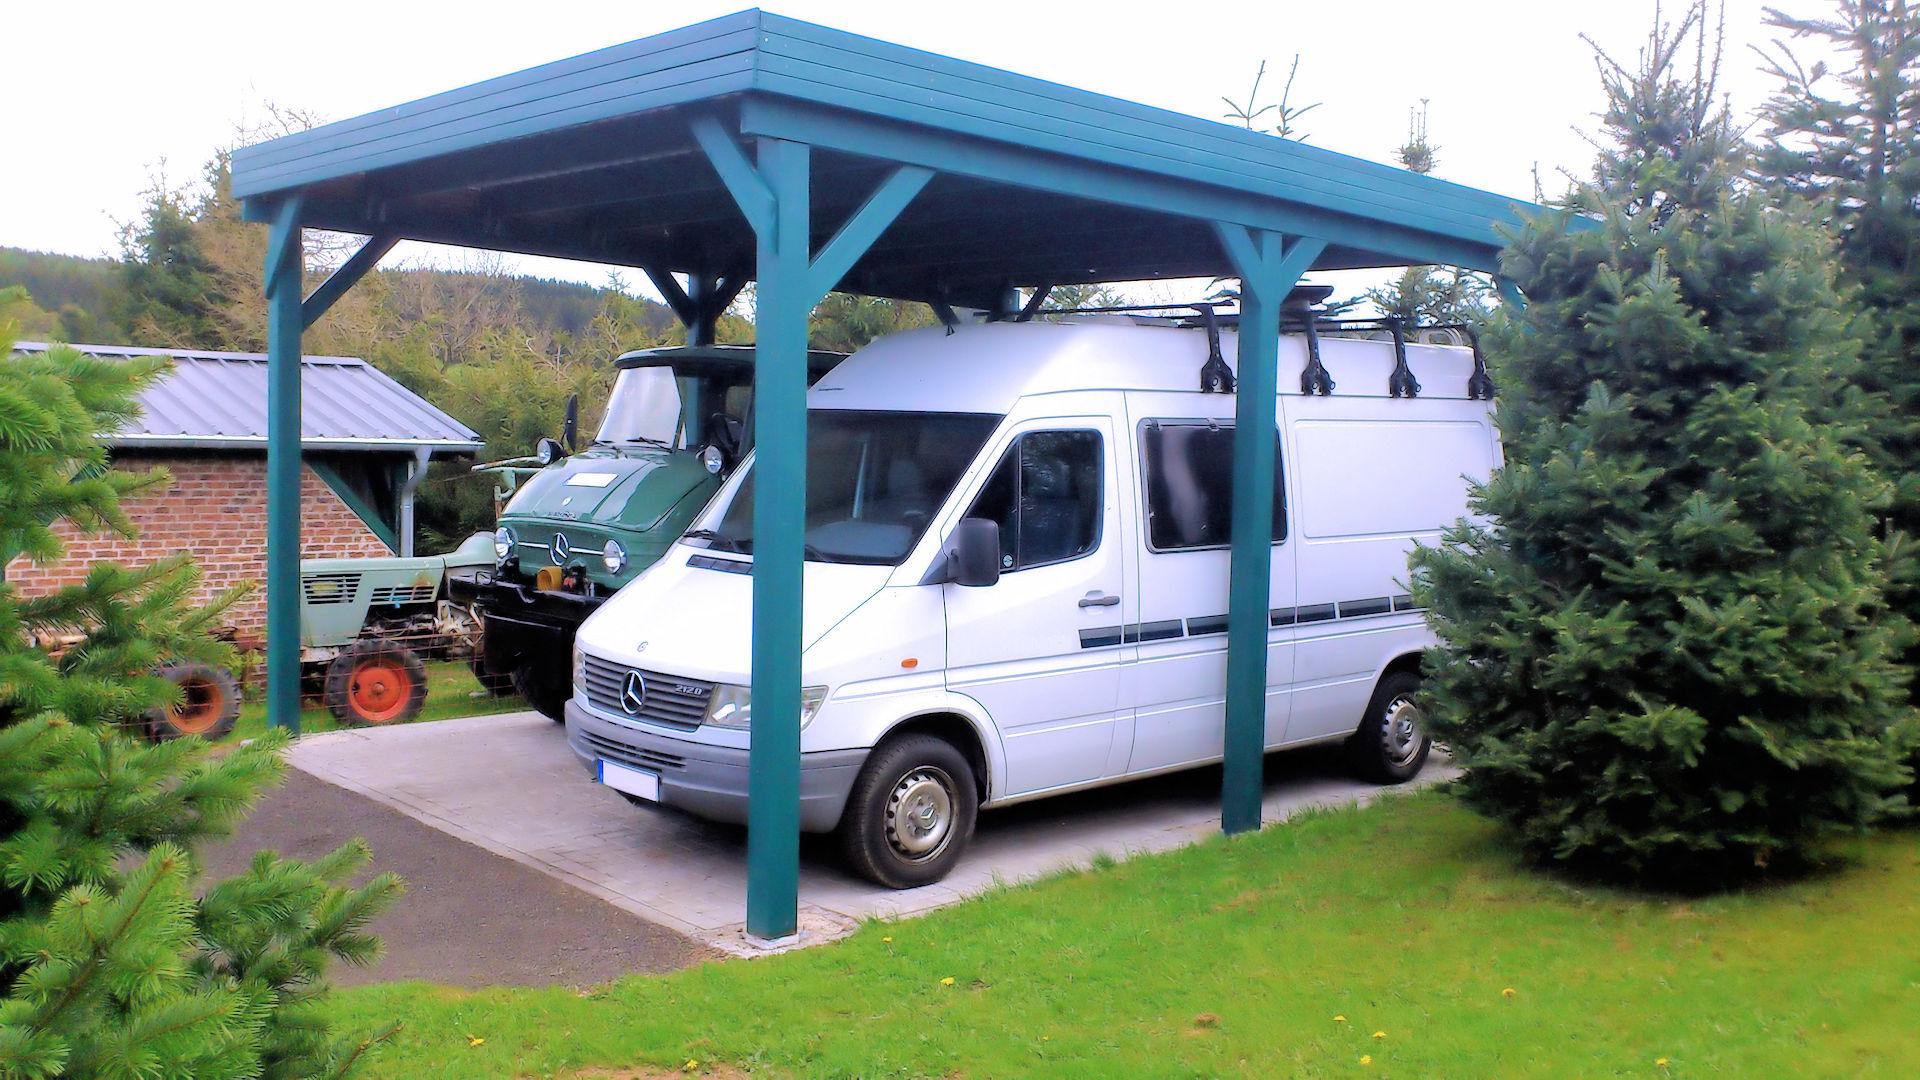 HD Wohnmobilcarport aus Holz - bauseitig grün lasiert